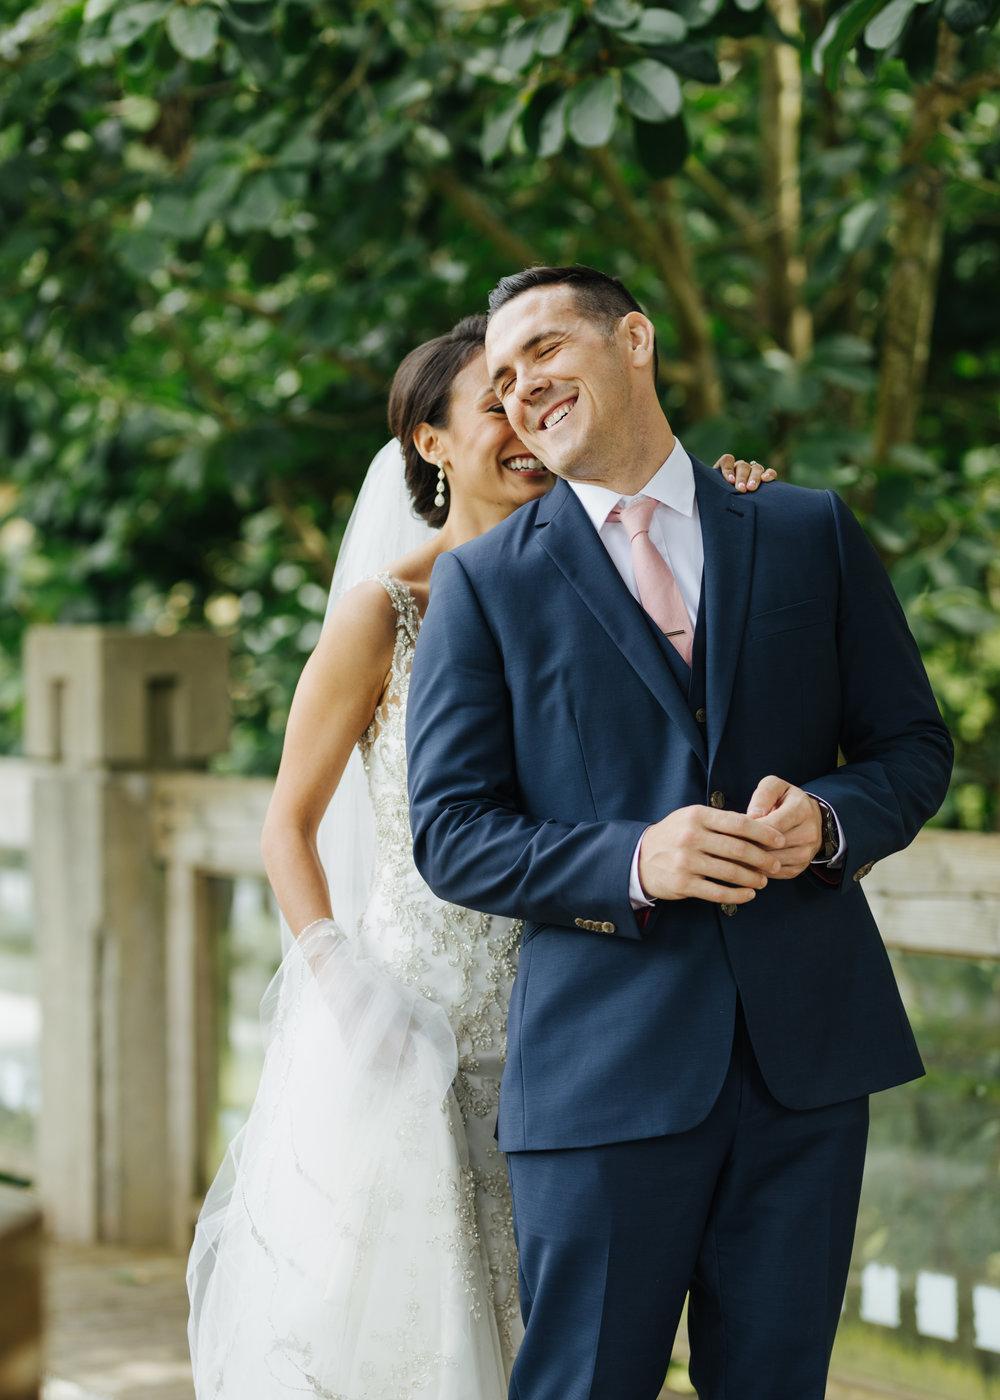 herafilms_wedding_jayne_connor_hera_selects-34.jpg